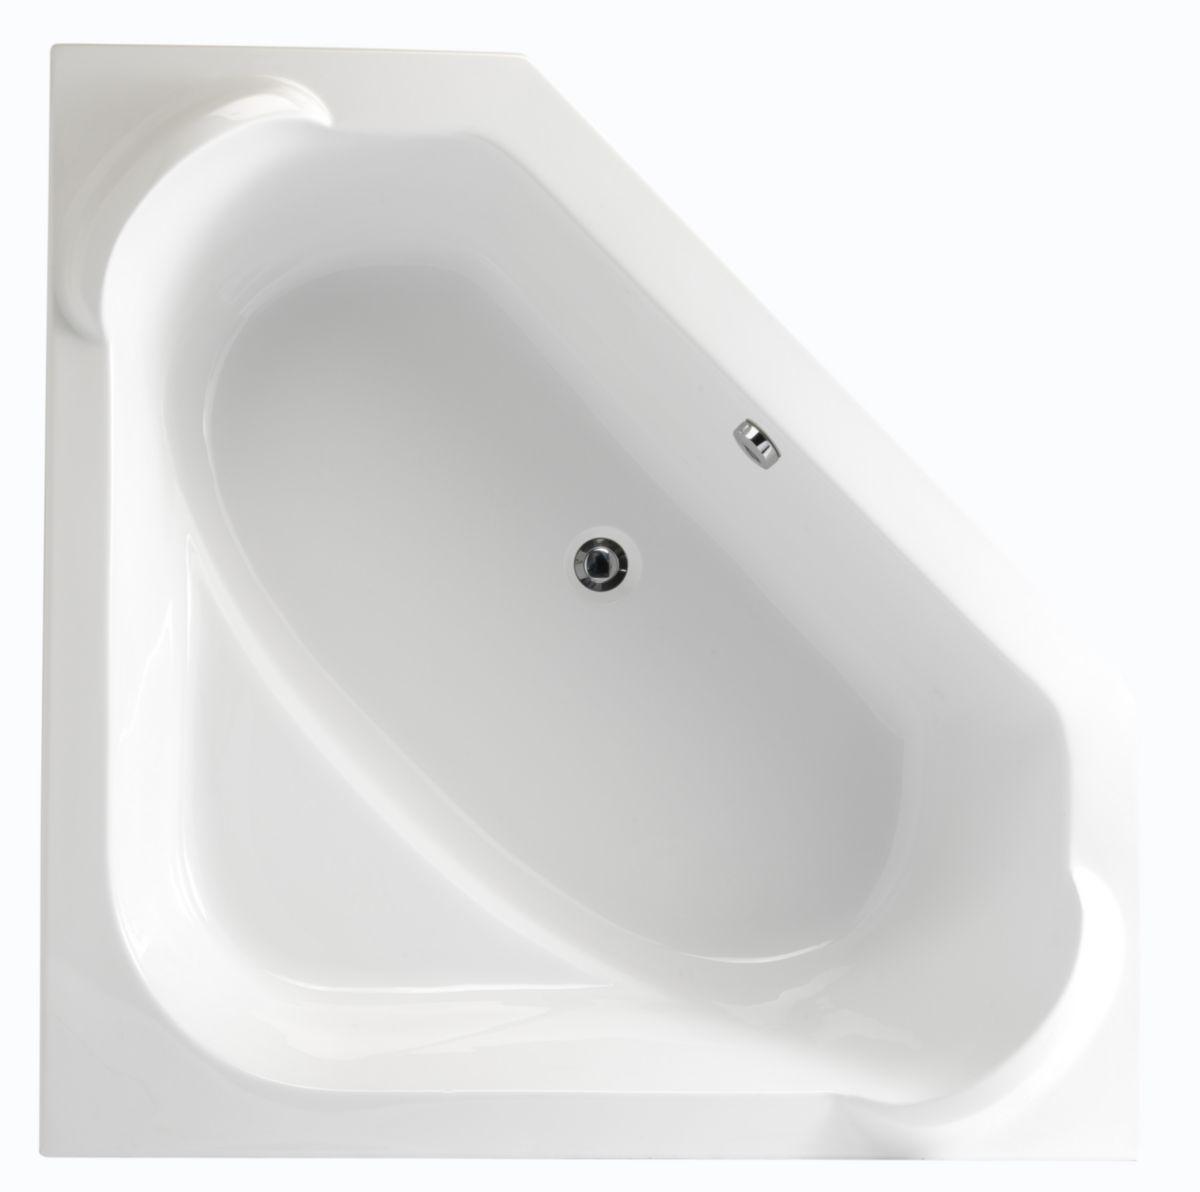 baignoire d 39 angle concerto 140x140 cm blanc acrylique r f p015501 alterna. Black Bedroom Furniture Sets. Home Design Ideas